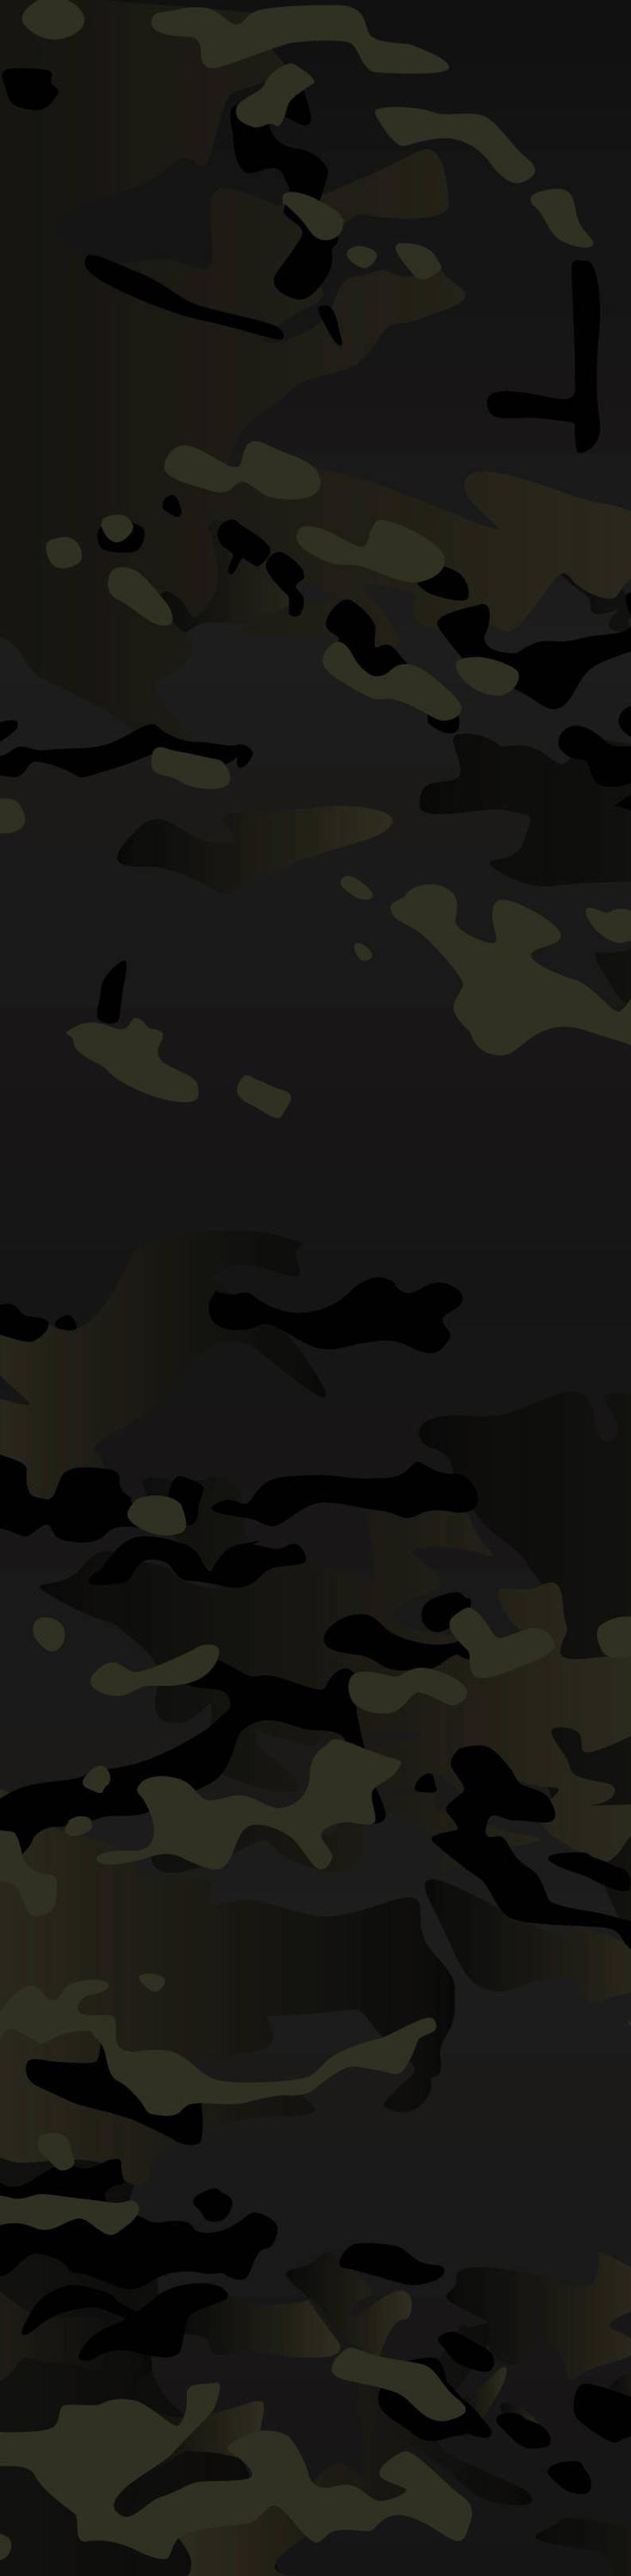 Ocp Black Vector Camouflage Pattern For Printing Scorpion Army Uniform Print Texture Military Camo Black Night Urban Multicam Black Camo Wallpaper Camoflauge Wallpaper